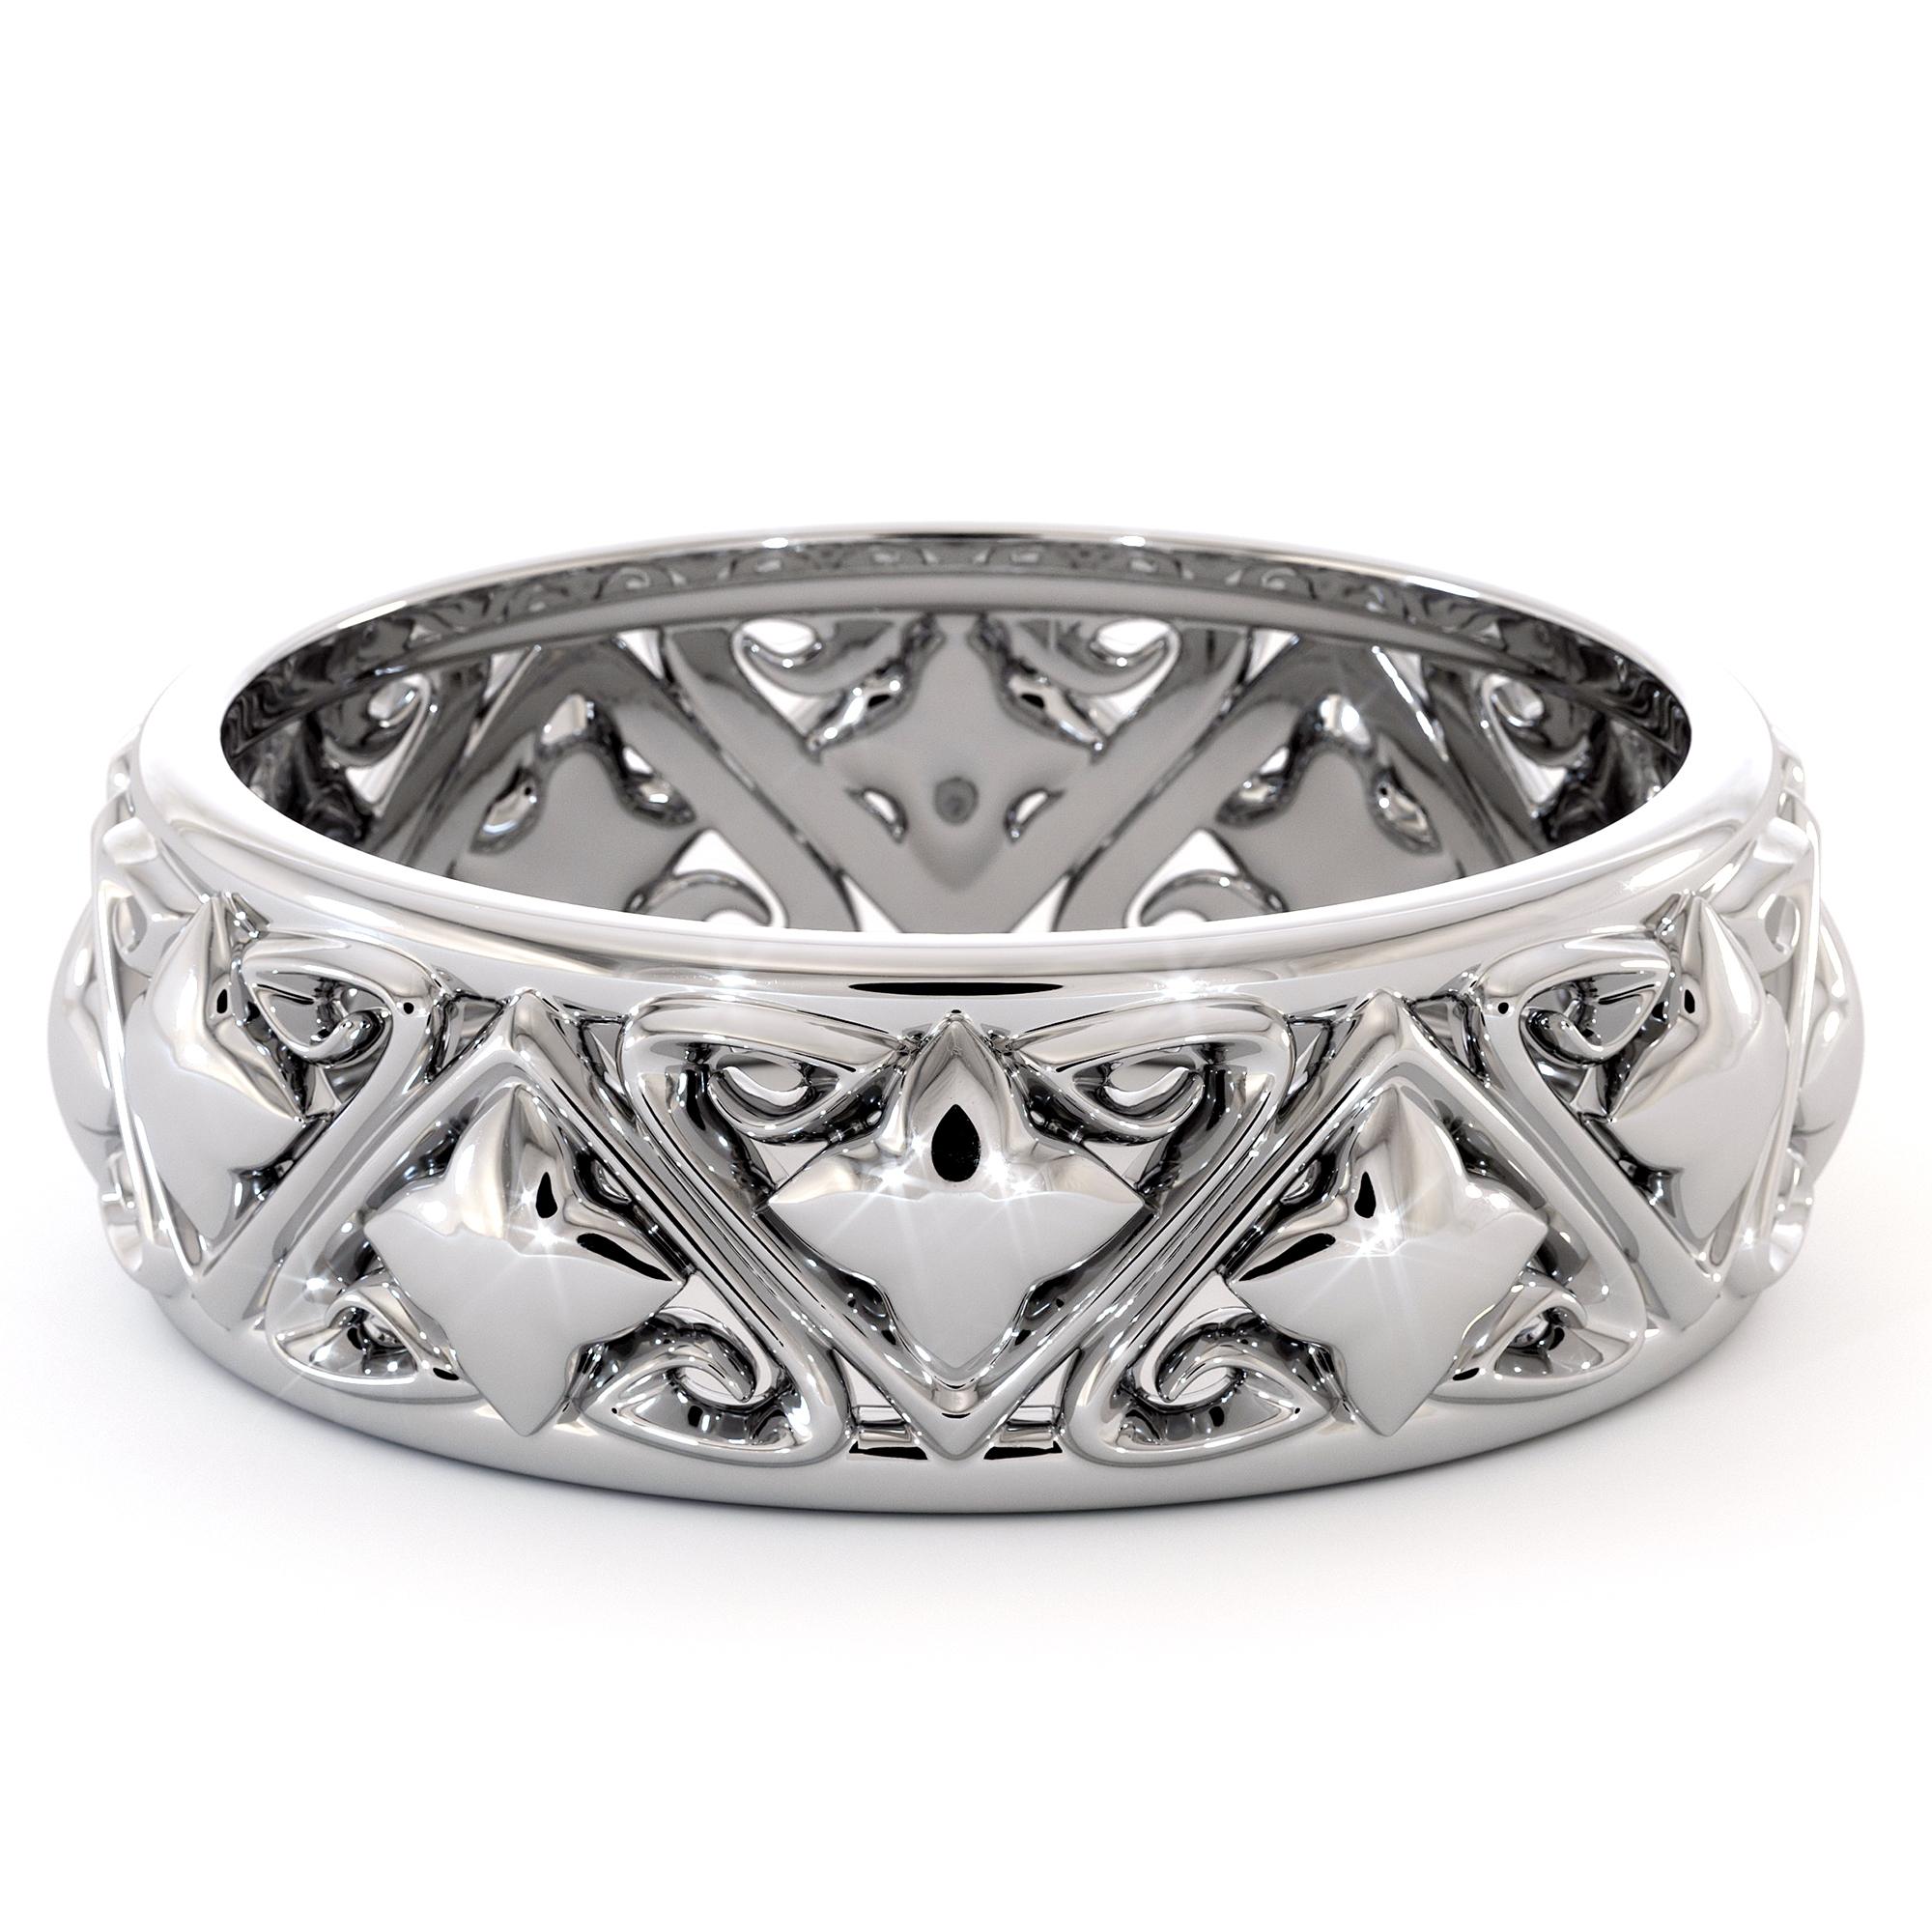 Unique Mens Wedding Band Triangle Filigree Mens Band Fine Jewelry